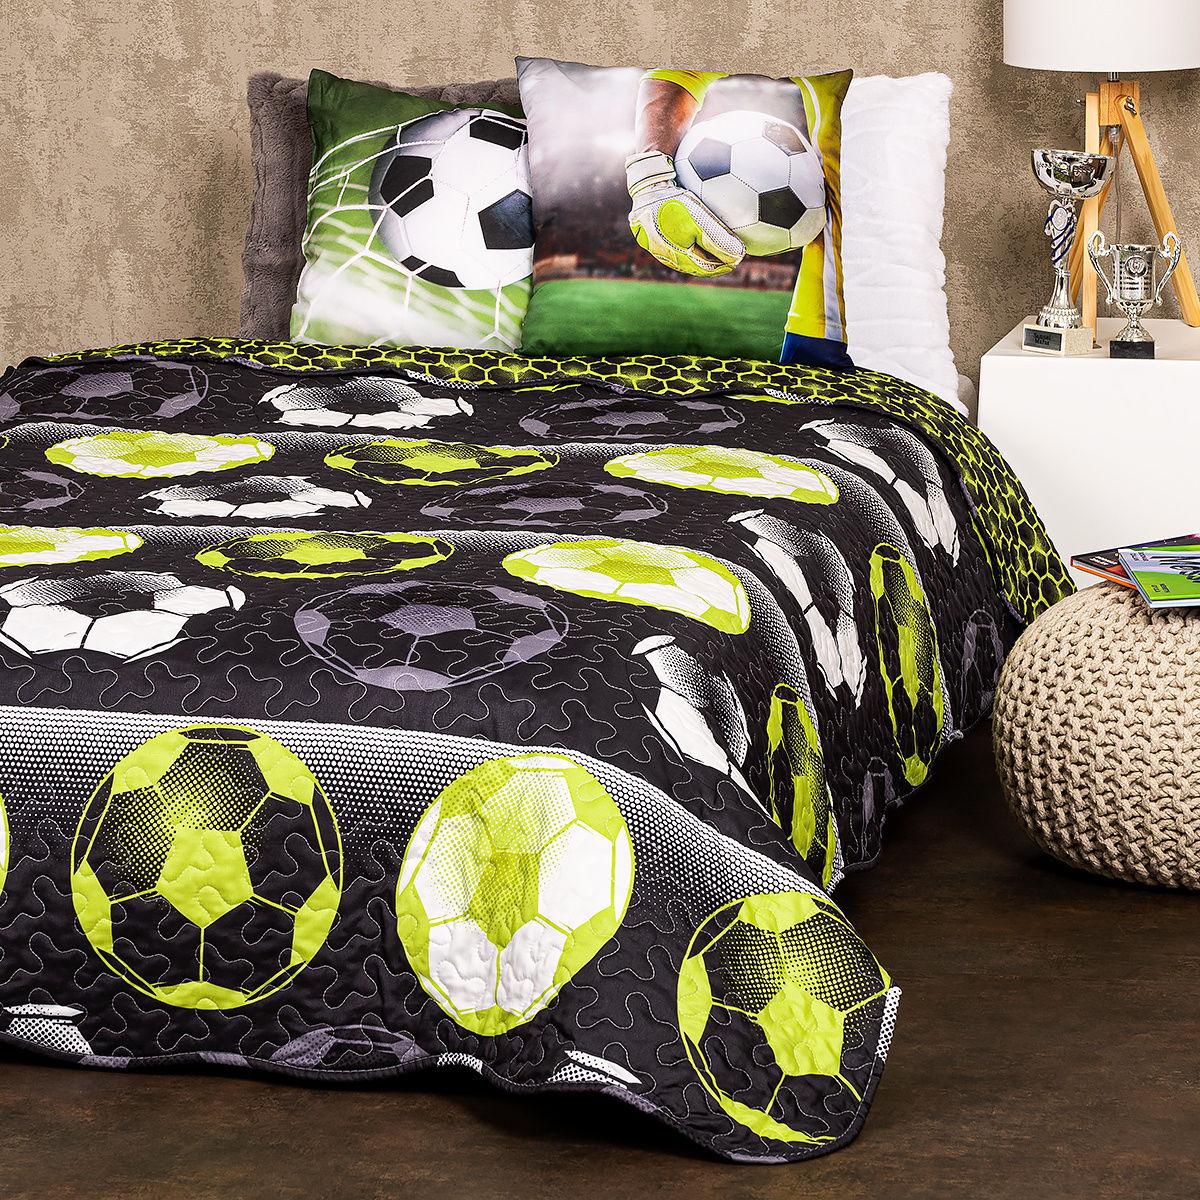 4Home Narzuta na łóżko Football, 140 x 220 cm